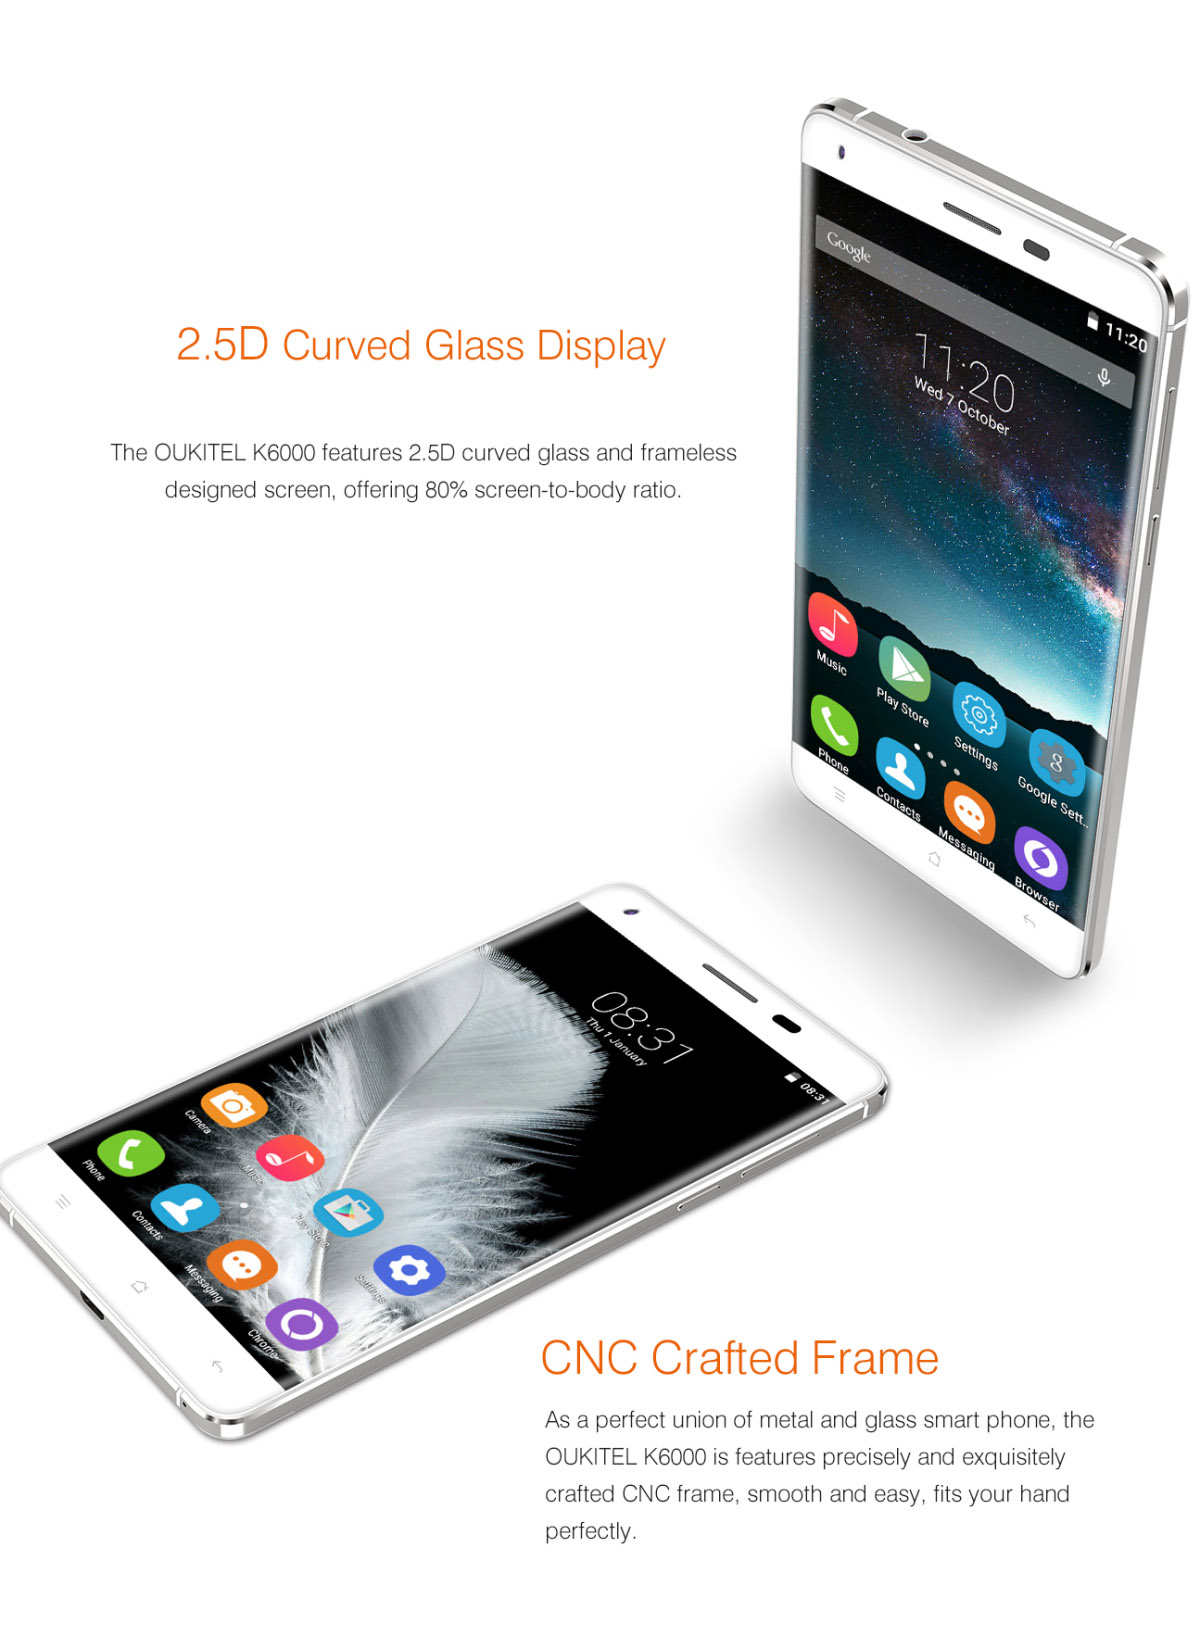 OUKITEL K6000, Test, Antutu, Benchmark, Akku Test, Akku Laufzeit, Smartphone ohne Vertrag, Smartphones günstig, bester Preis